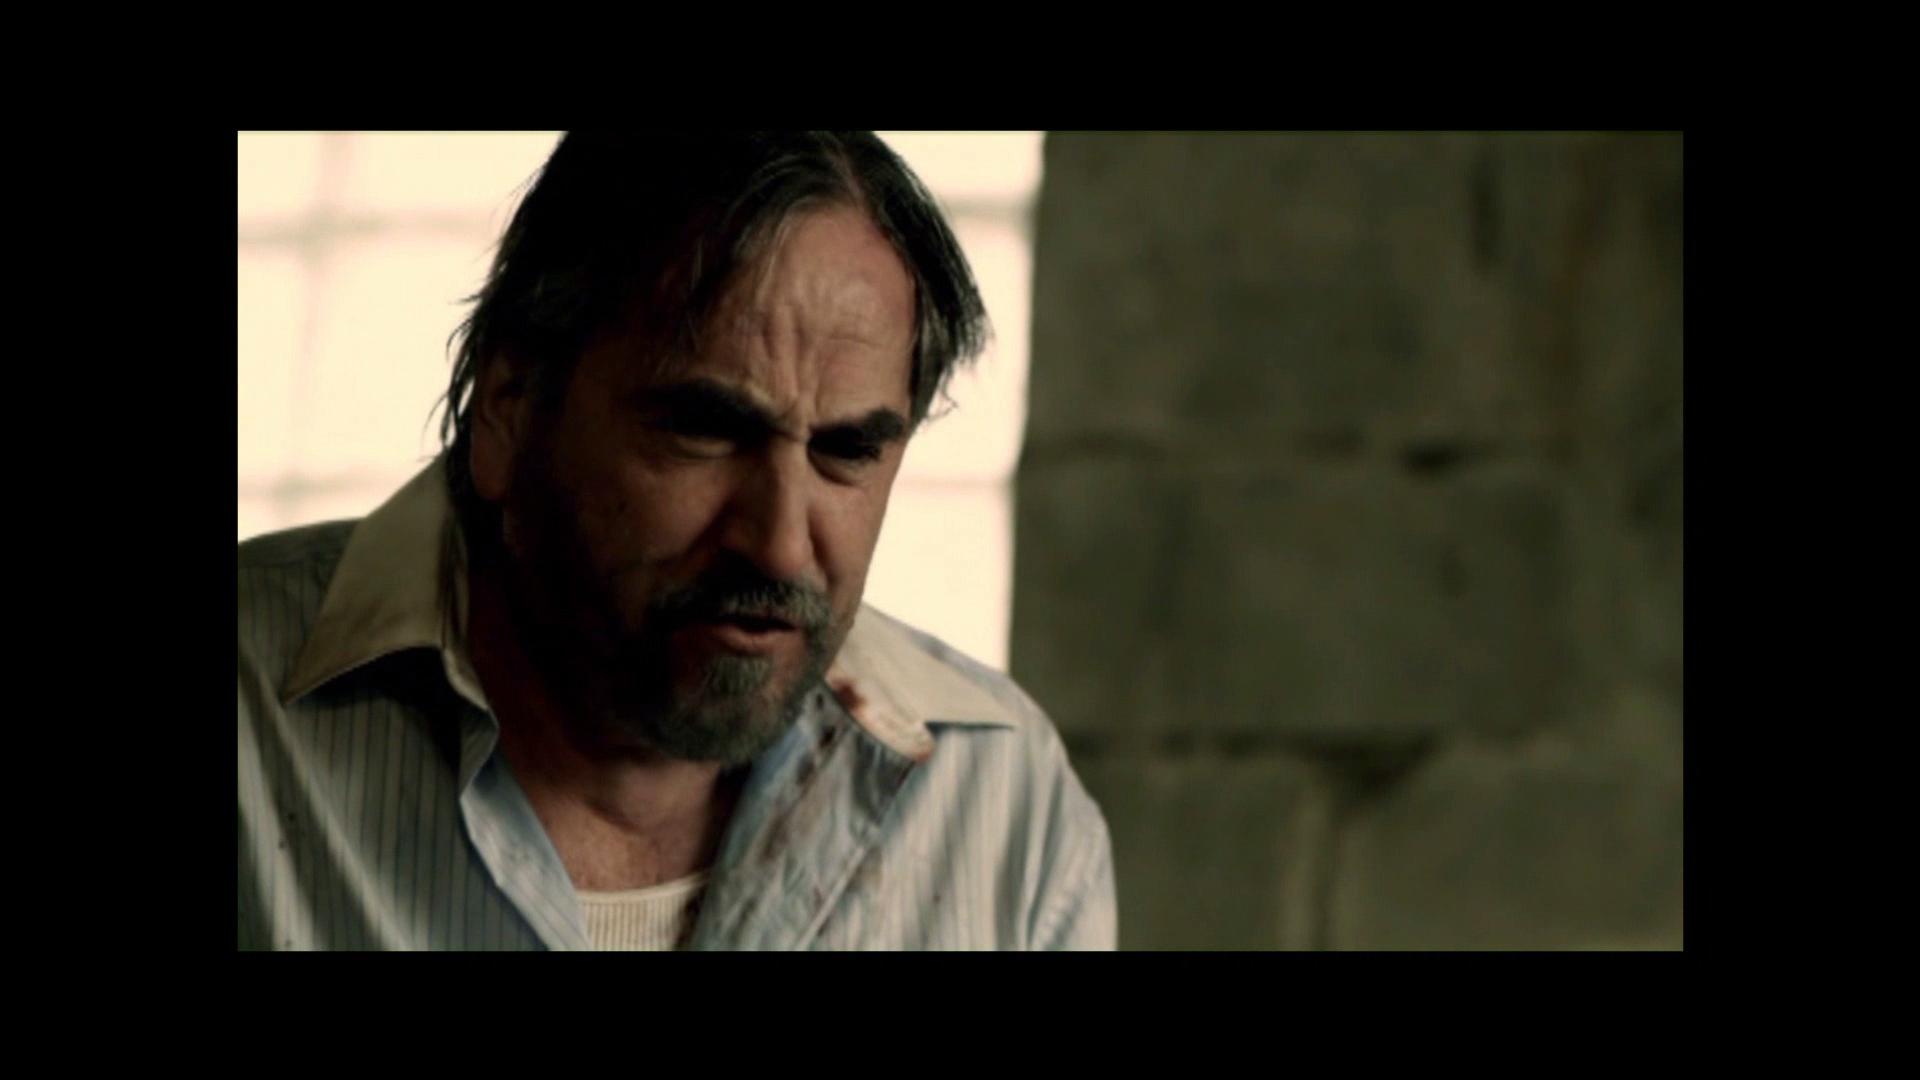 Profile of a Killer, Gabriele Angieri, Film, Thriller, Saul Aitken, Joey Pollari